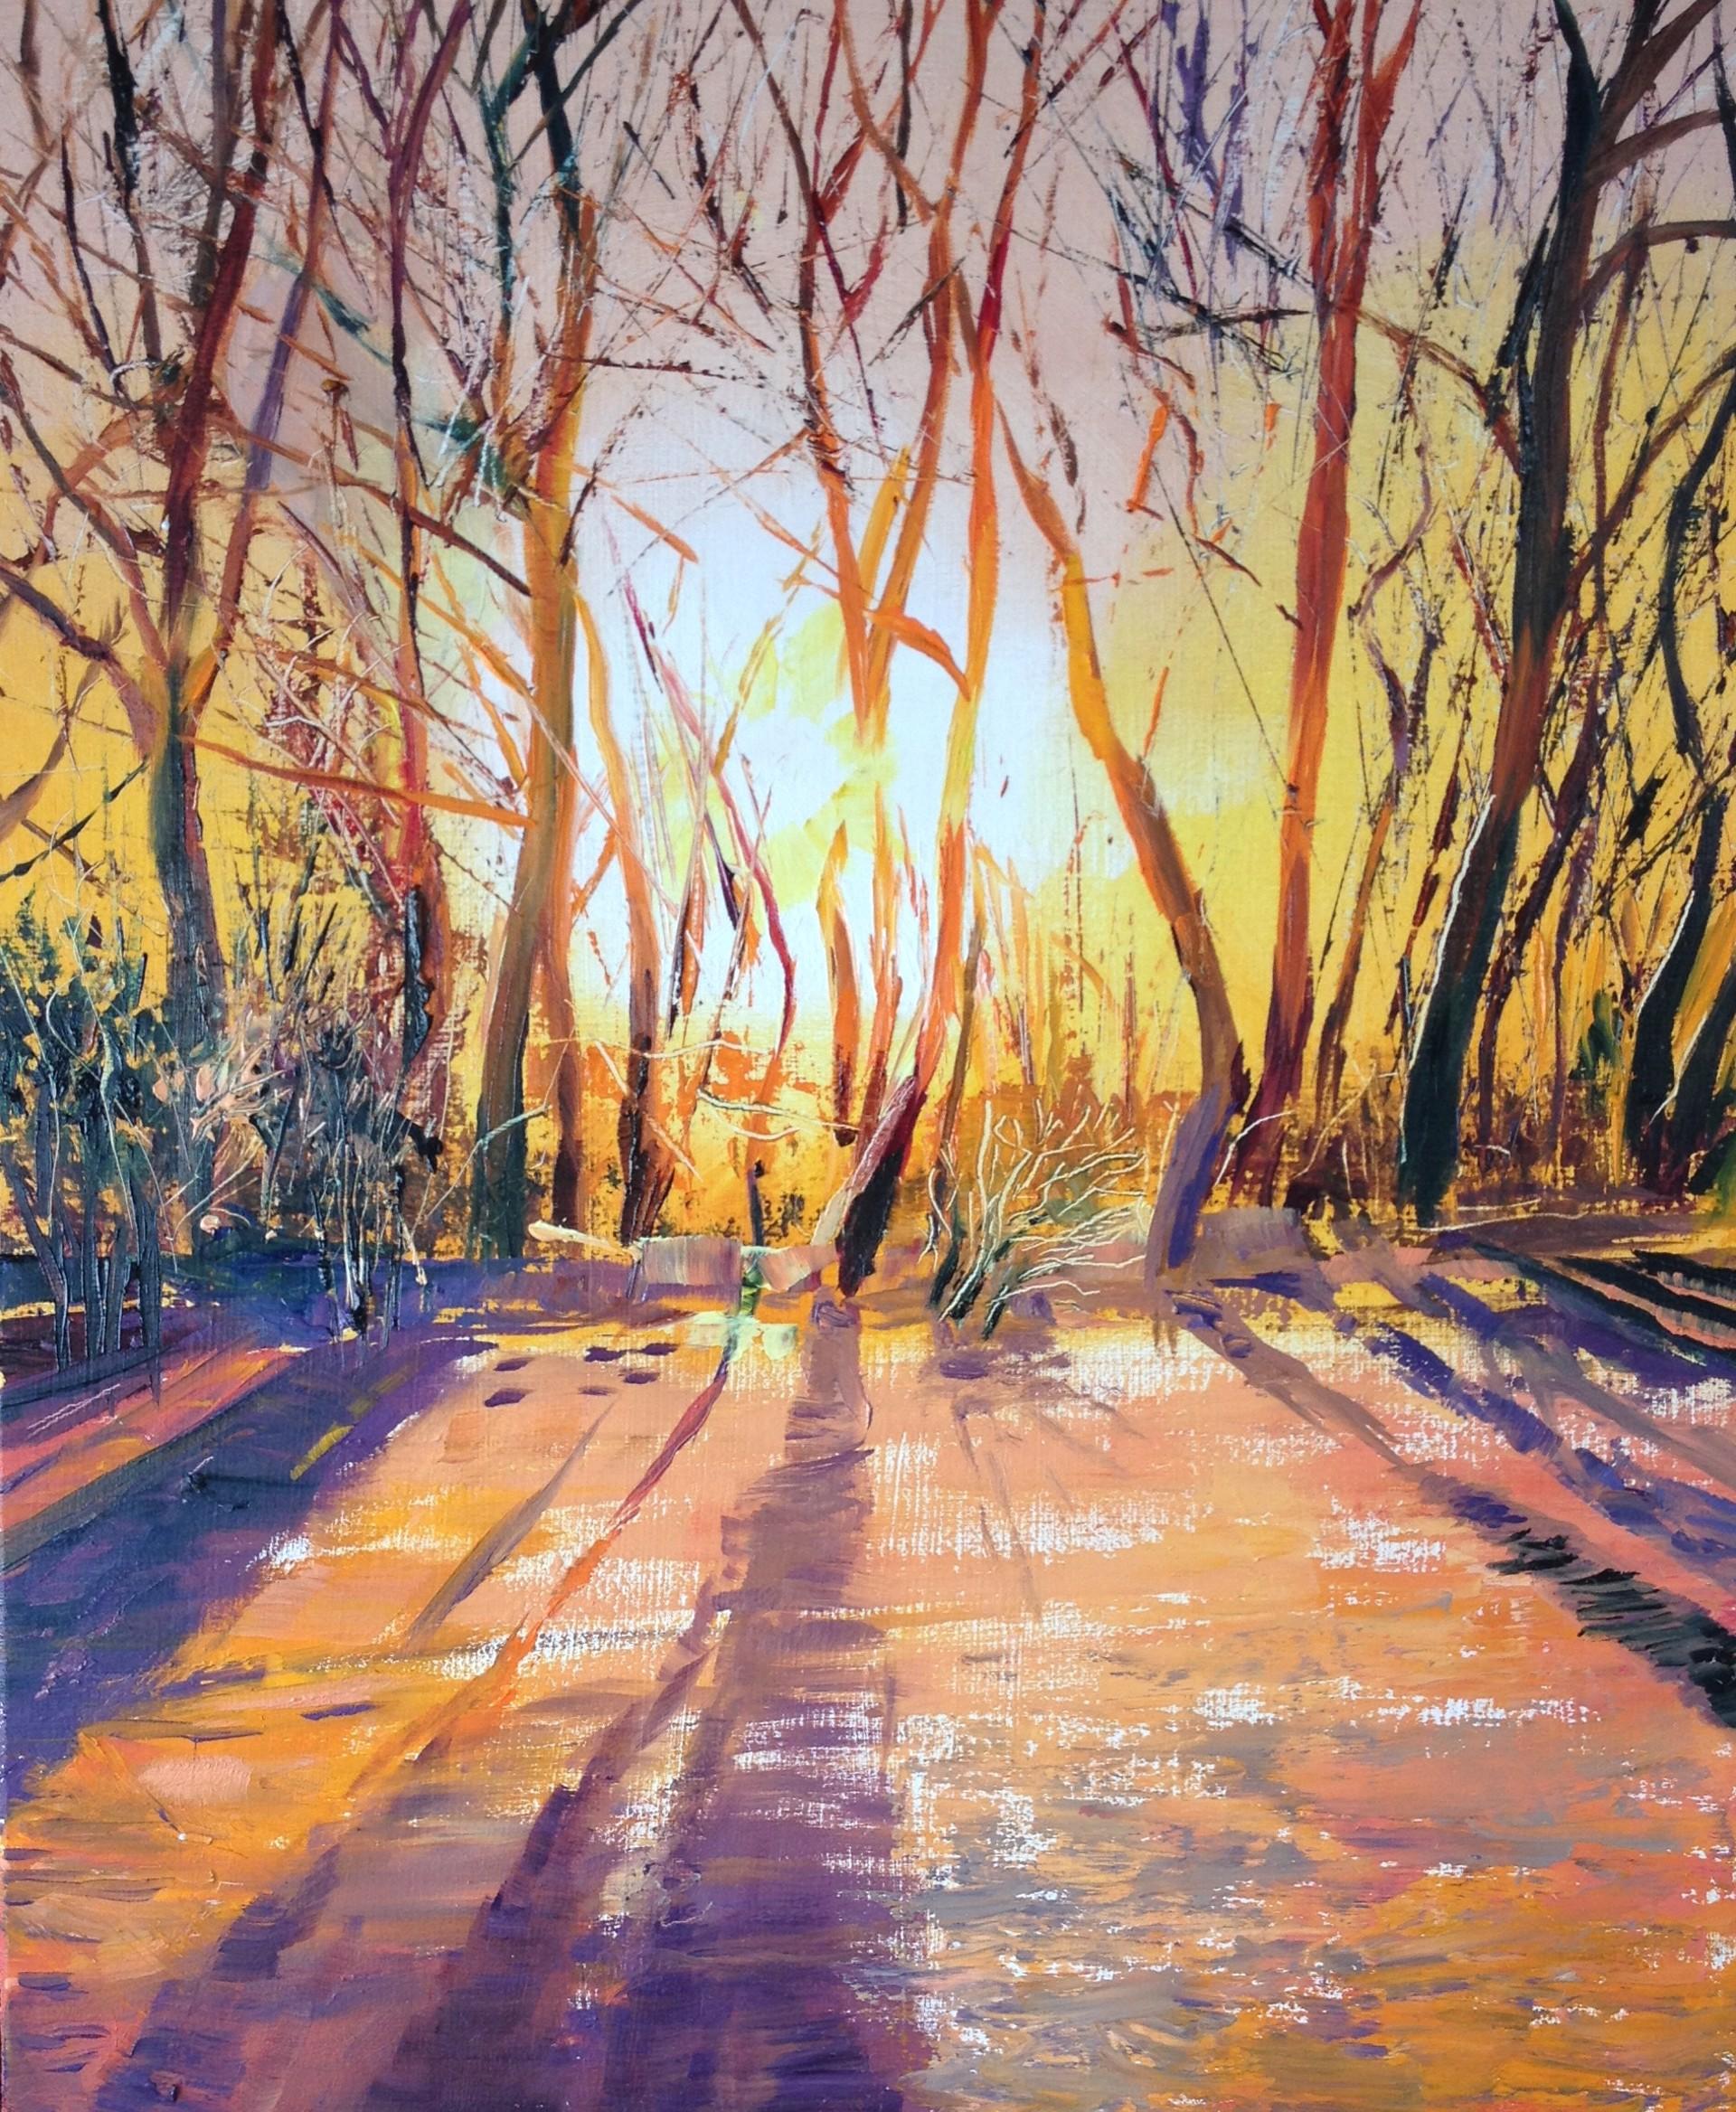 Winter Warmth by Dan Knepper